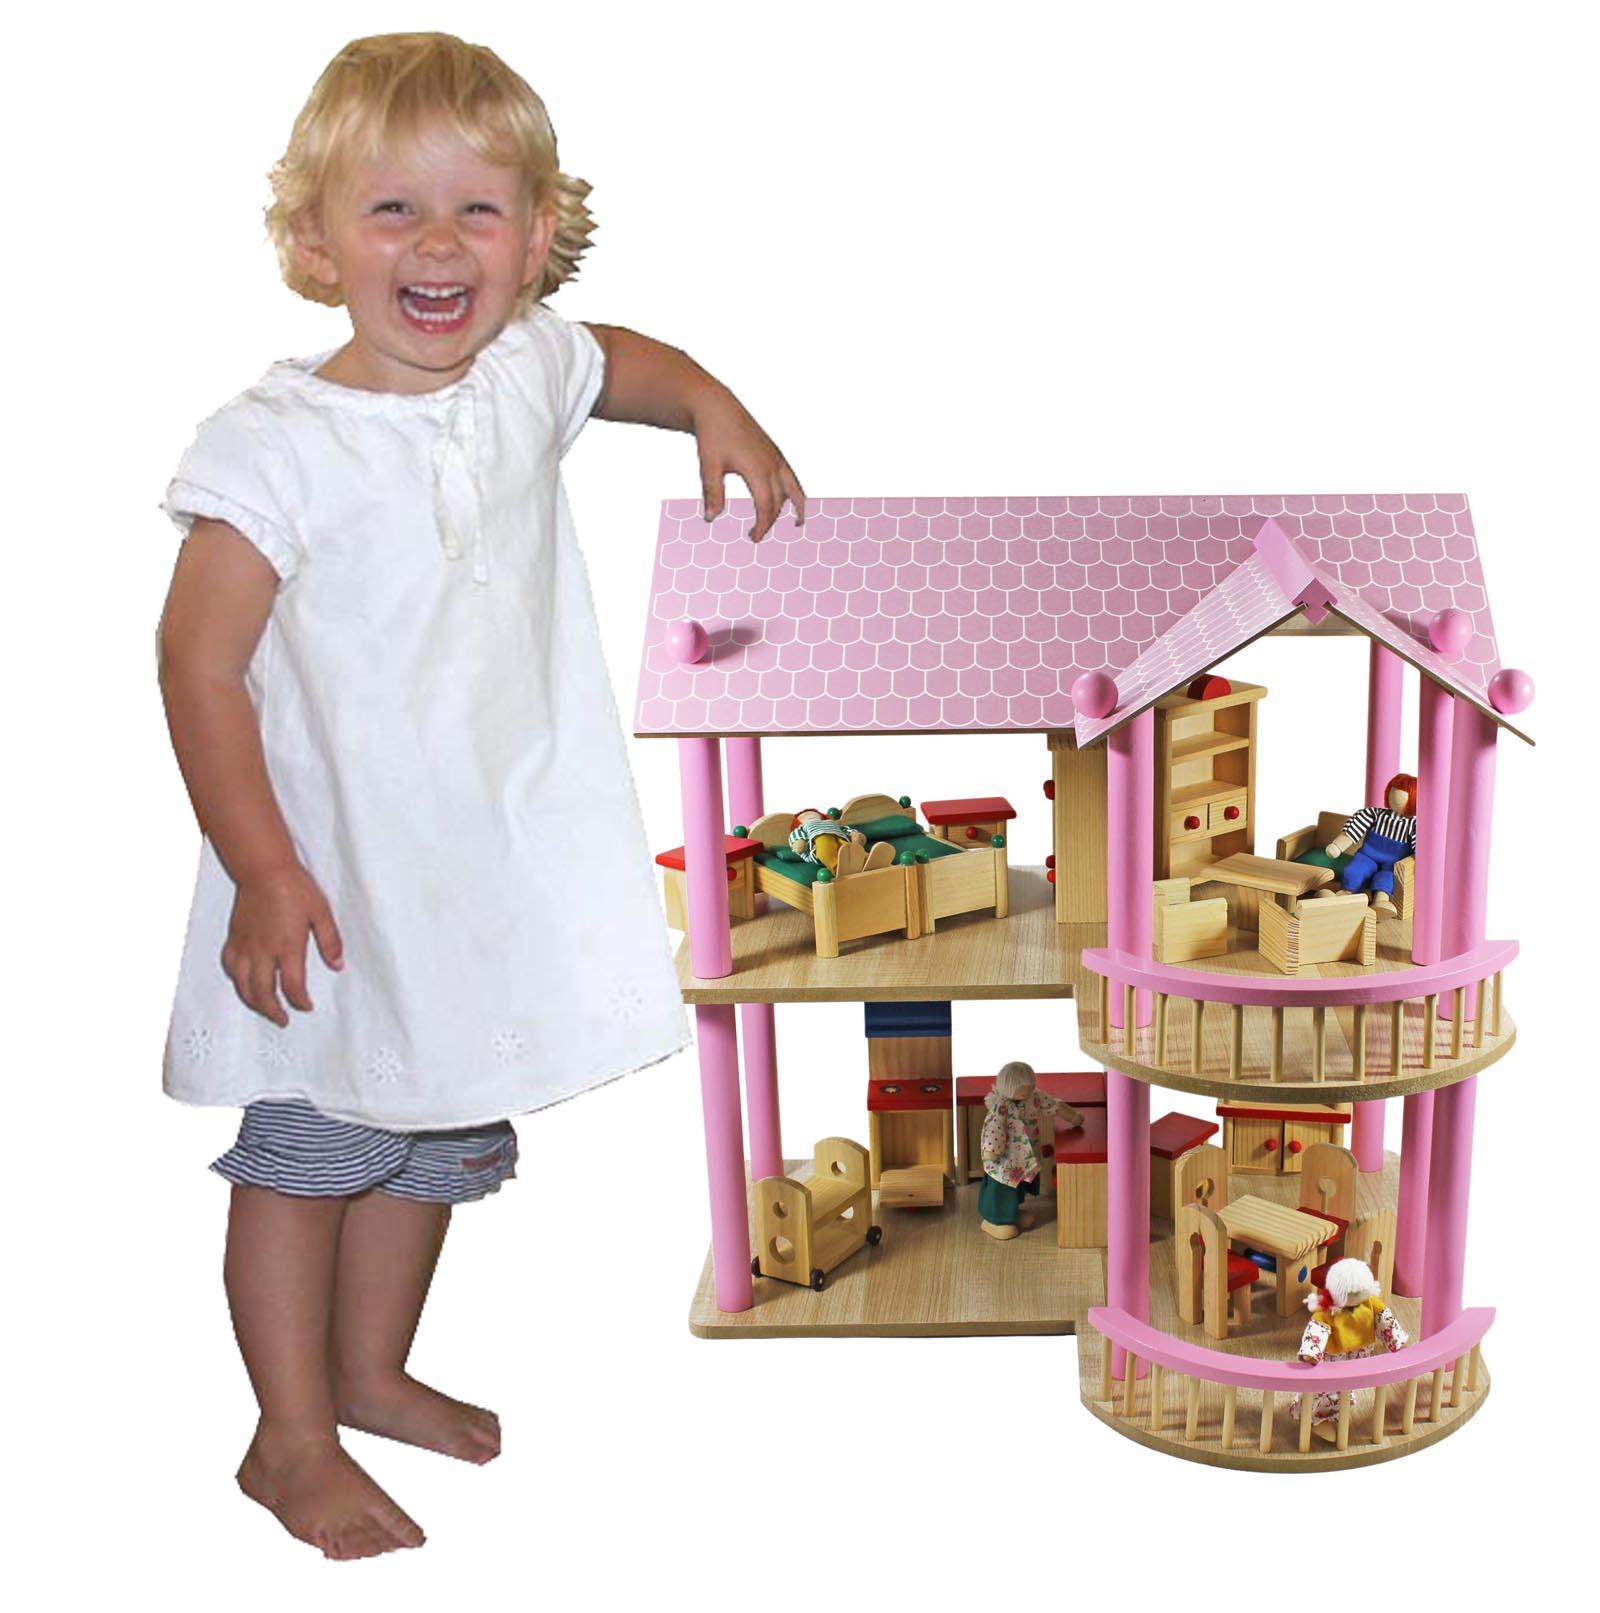 Puppenhaus Holz 30 Cm Puppen ~ riesiges XL Puppenhaus Villa aus Holz+ Möbel + Puppen 48x40x49,5cm